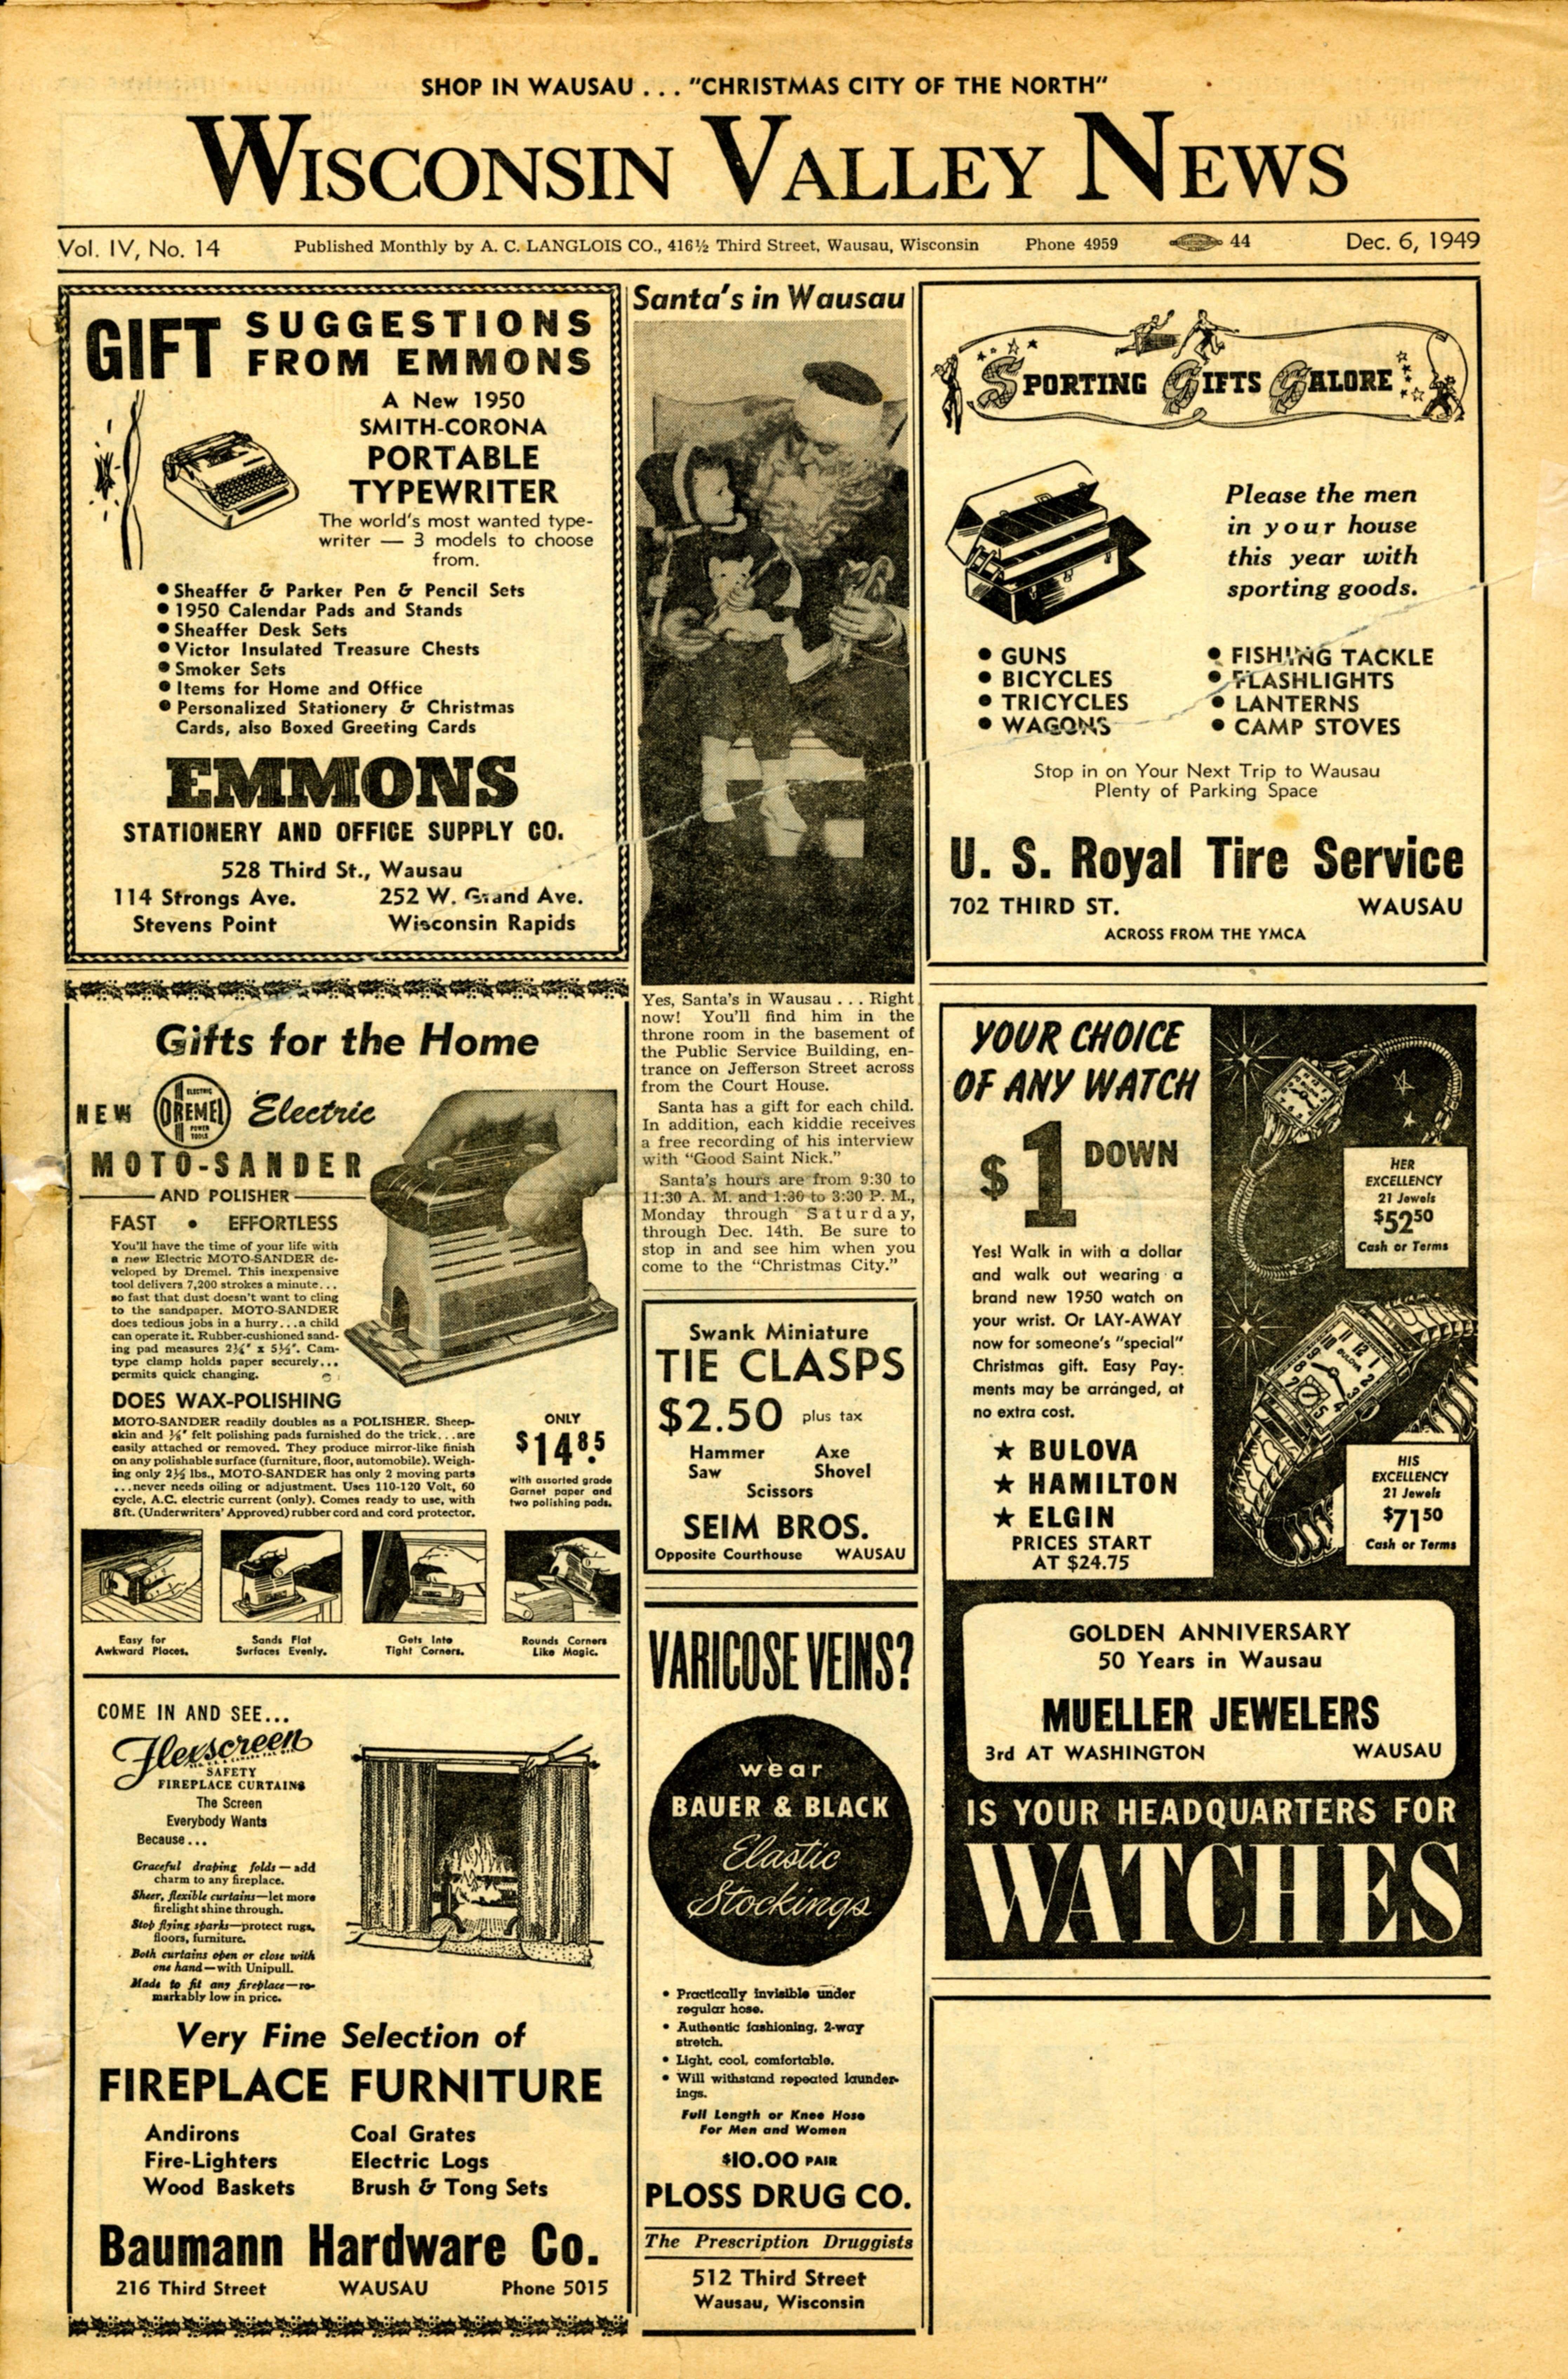 Wisconsin Valley News_December 6, 1949